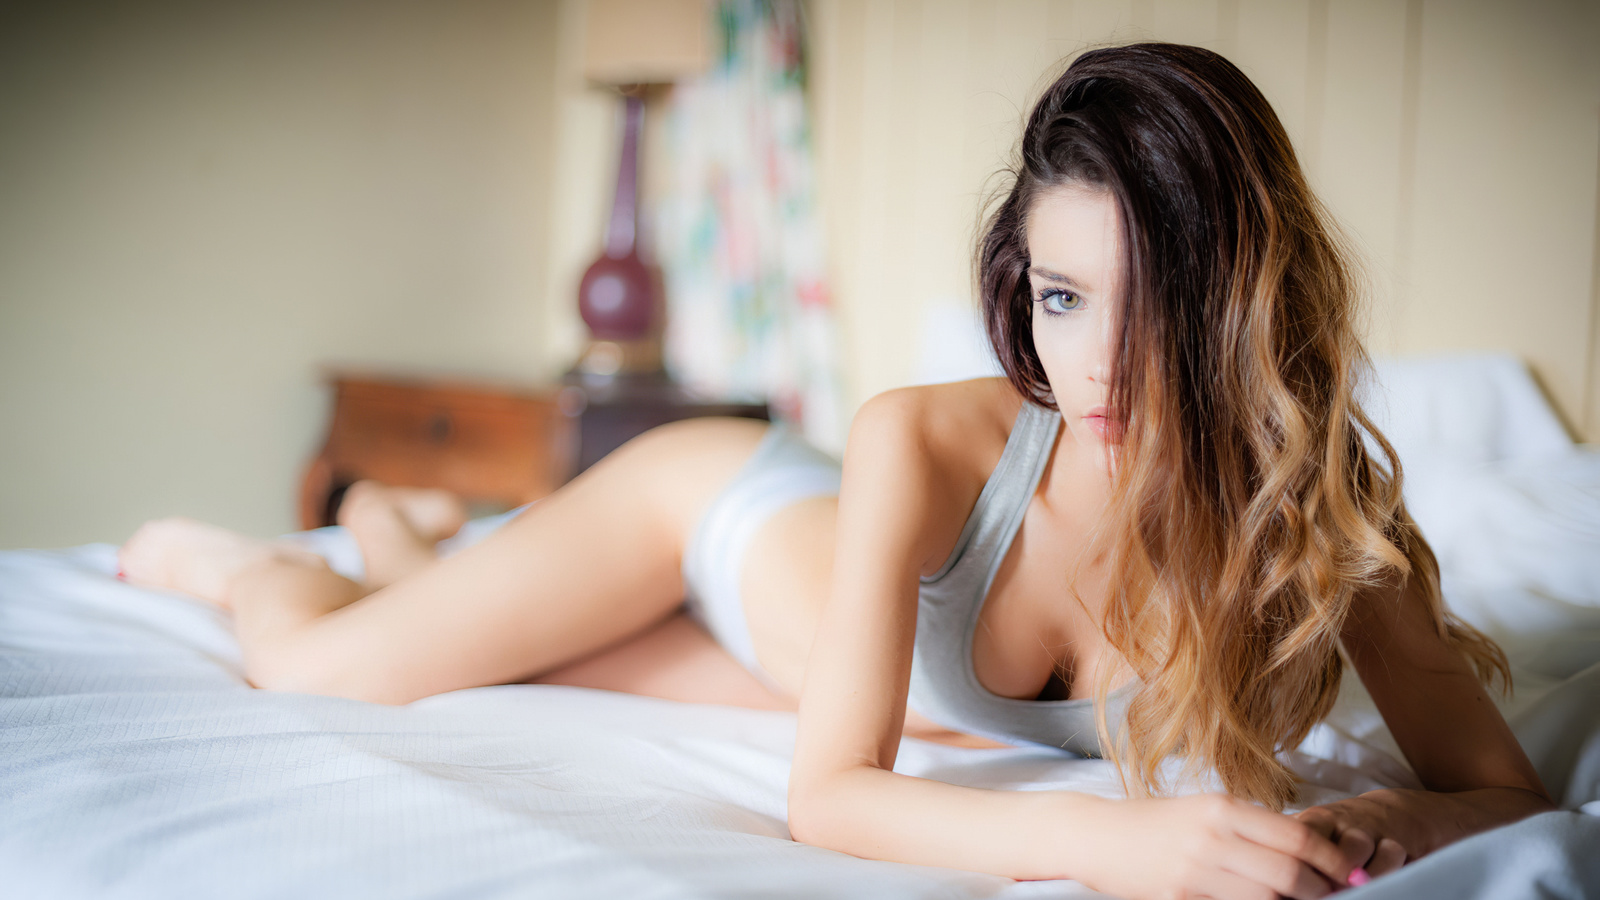 beautiful, women, cute, blonde, pretty, window, sexy, bed, model, perfect, top, panties, brunette, eyes, hot, boobs